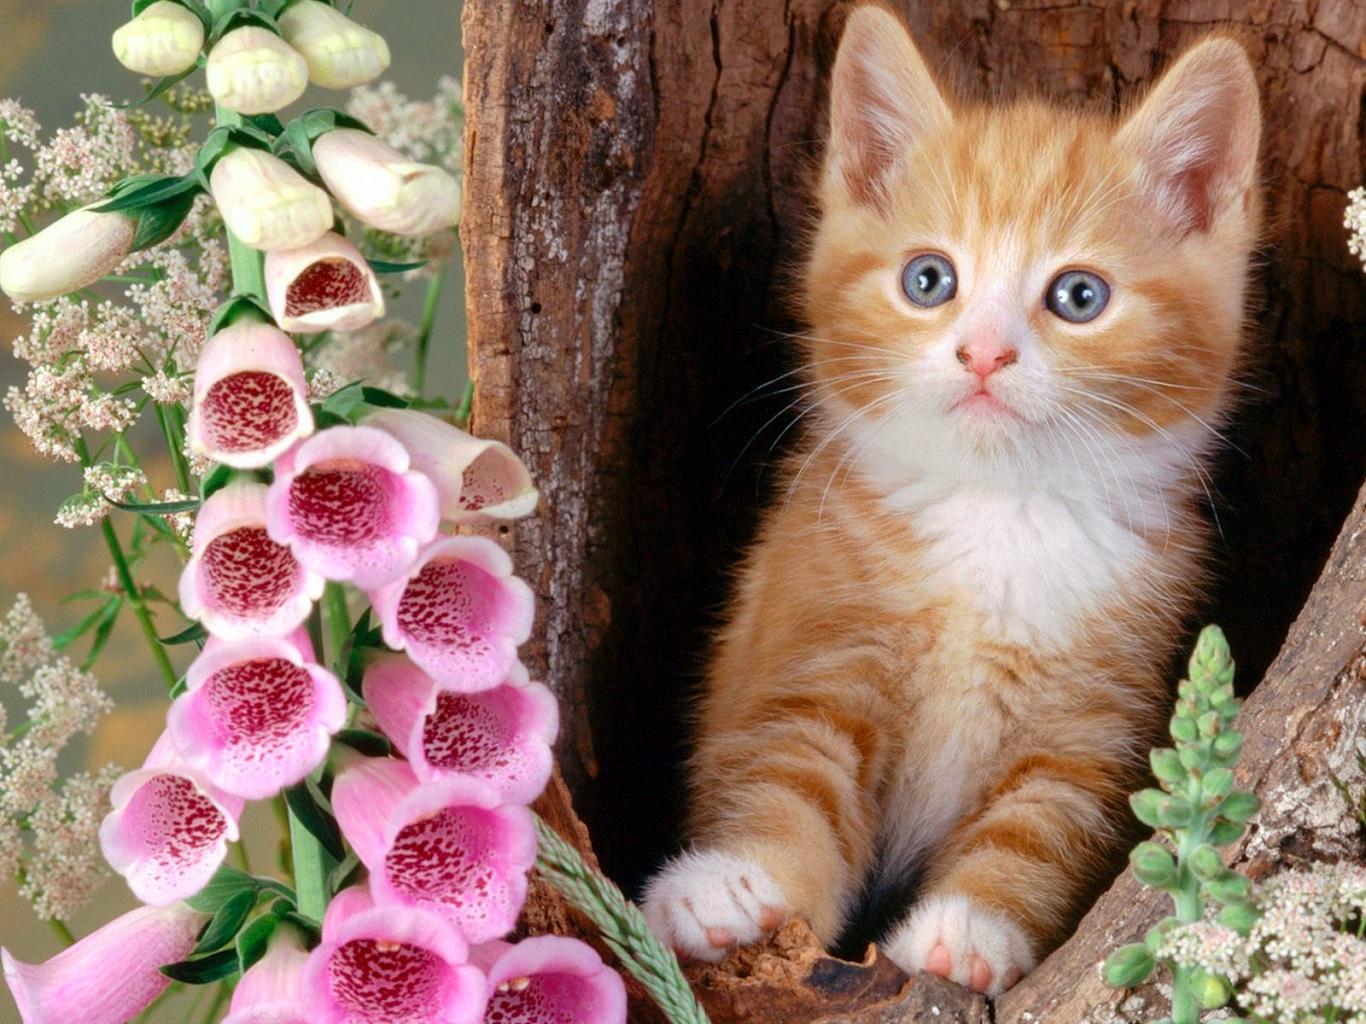 بالصور صور قطط متحركة , صور قطط كيوت 6317 8